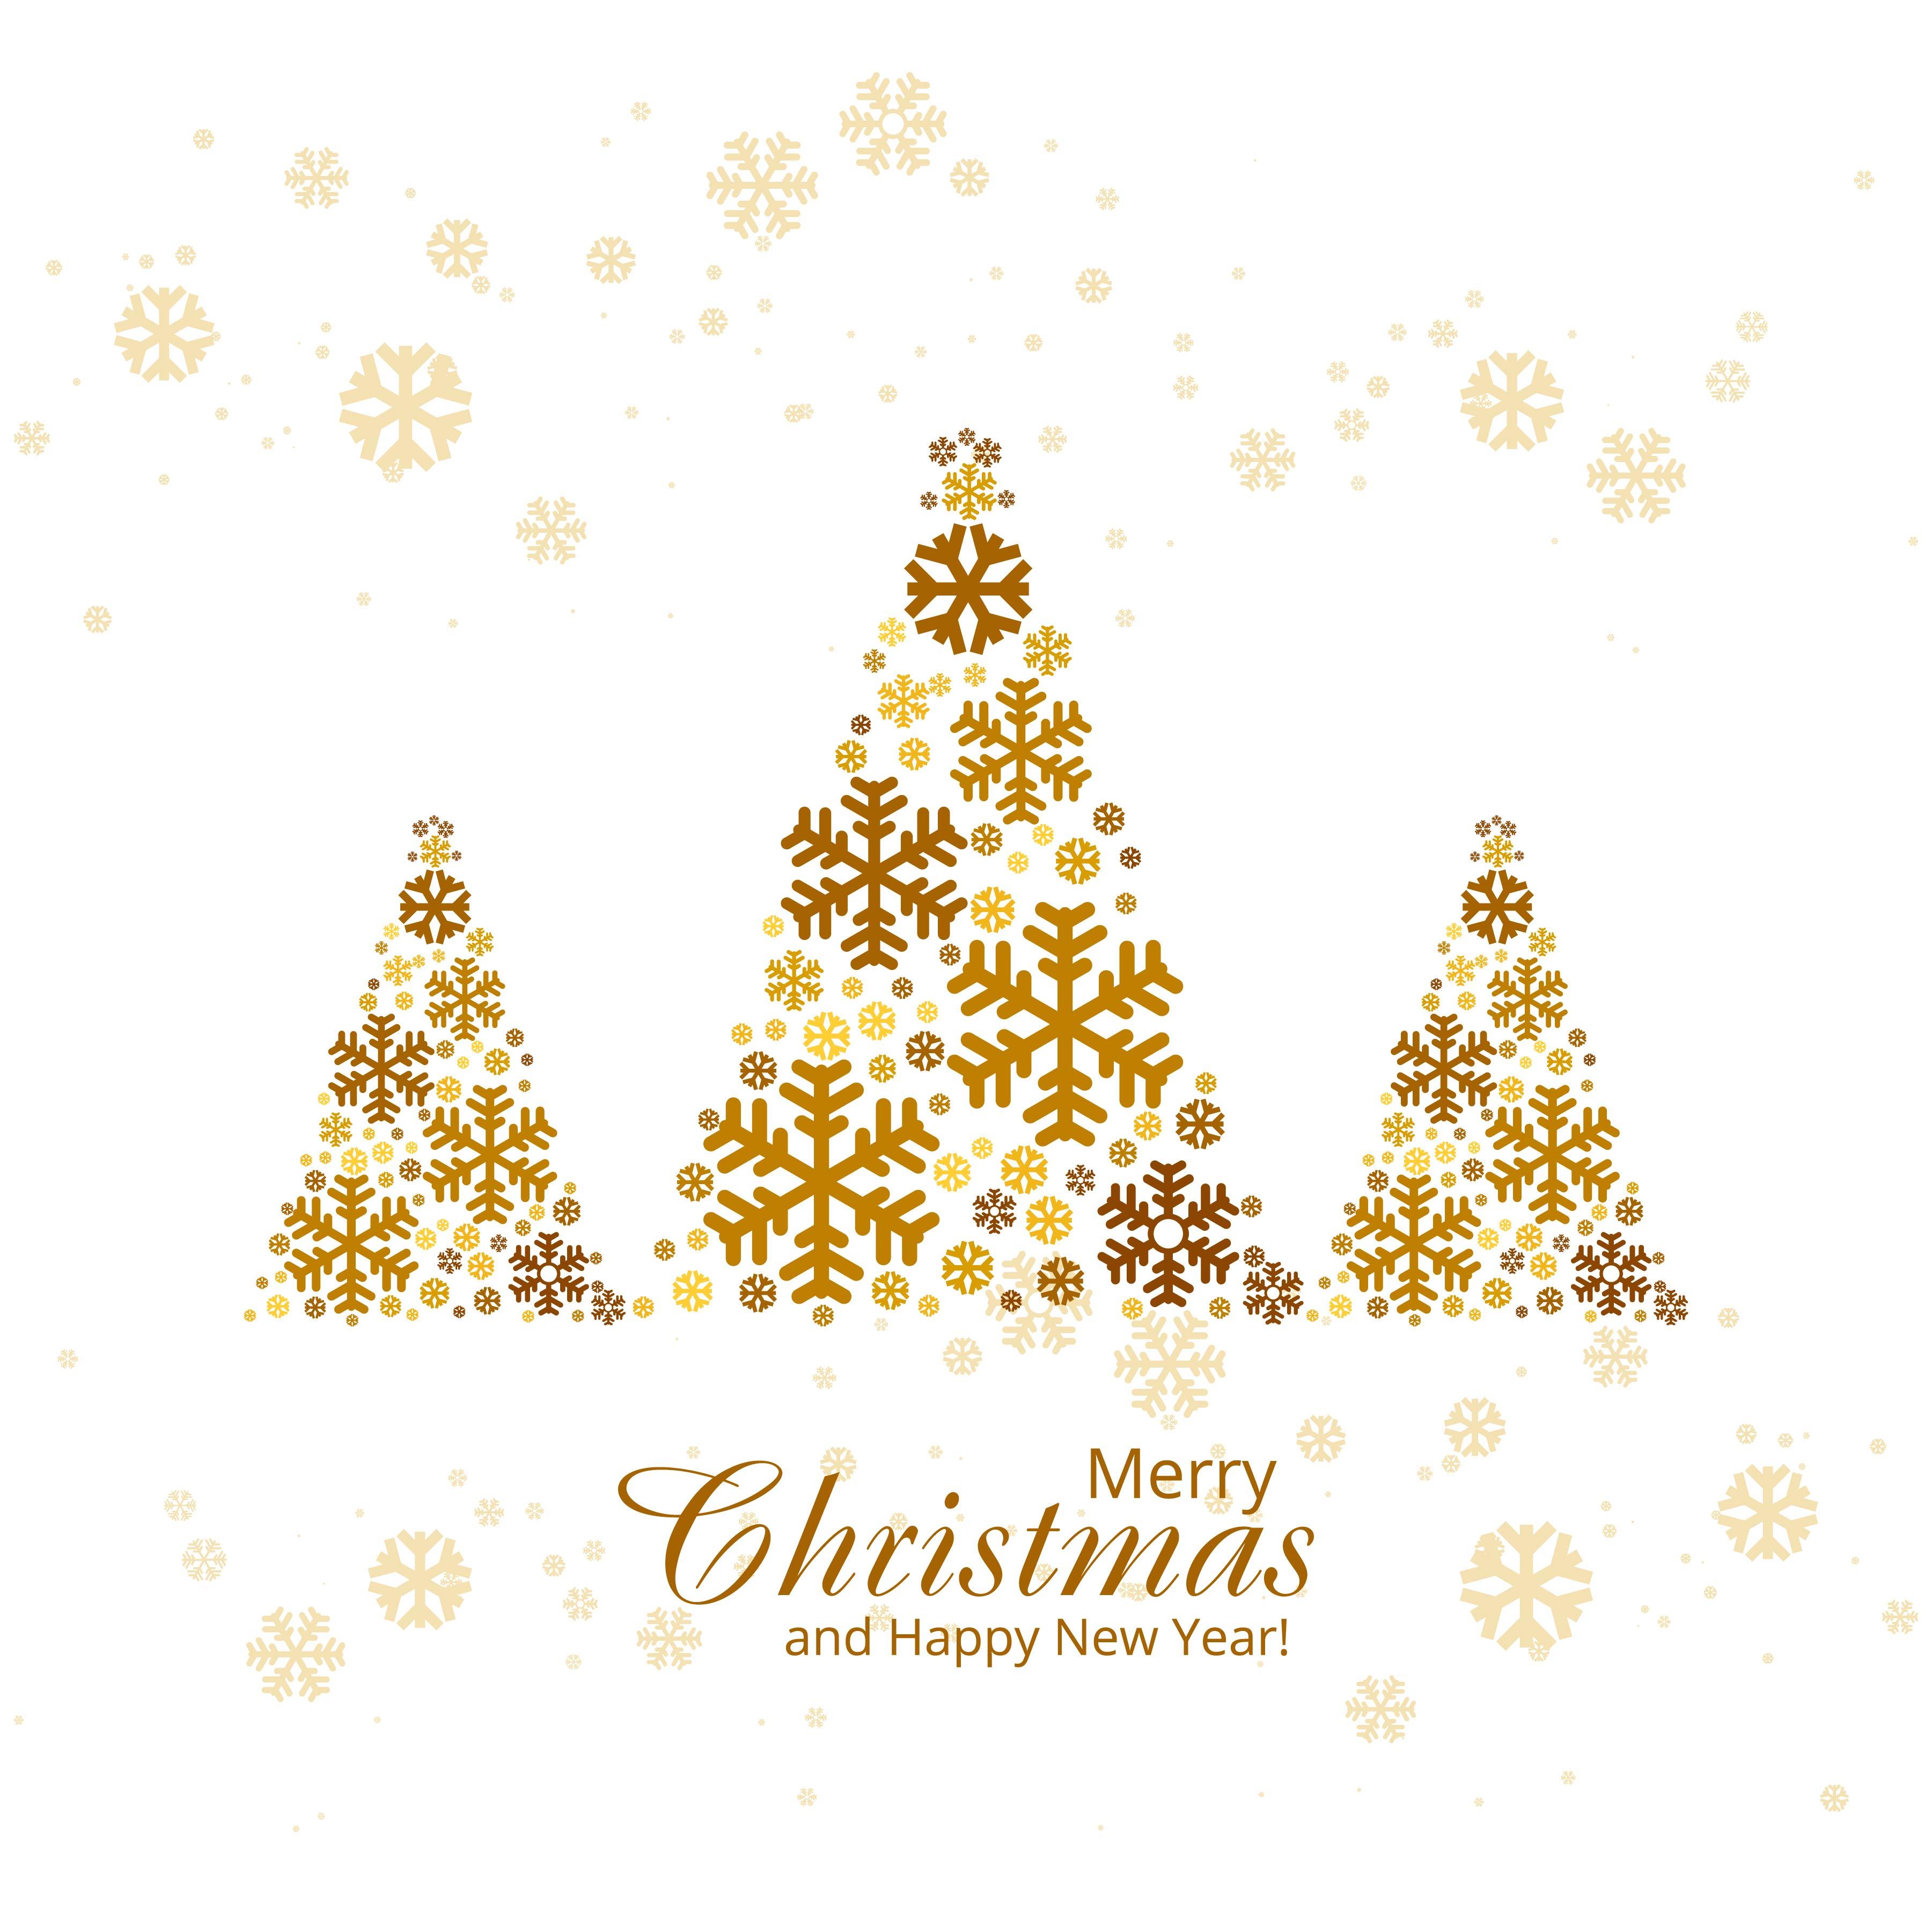 Christmas Tree Merry Christmas: Merry Christmas Greeting Card With Christmas Tree